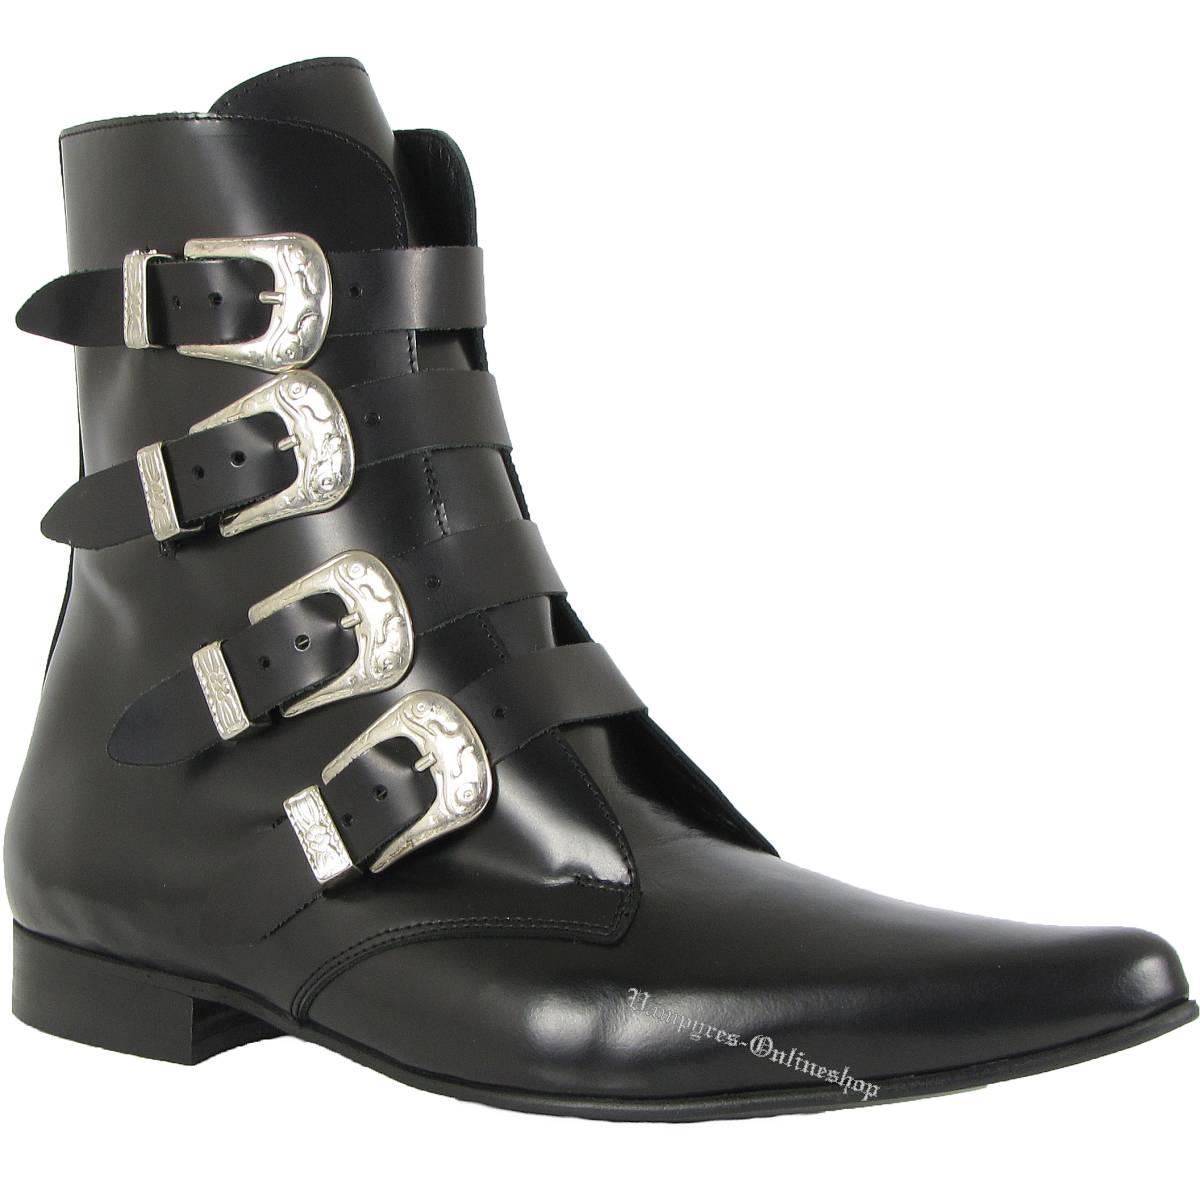 Boots & Braces Winkelpiker 4 Buckle Schwarz Schnallen Pikes Schuhe